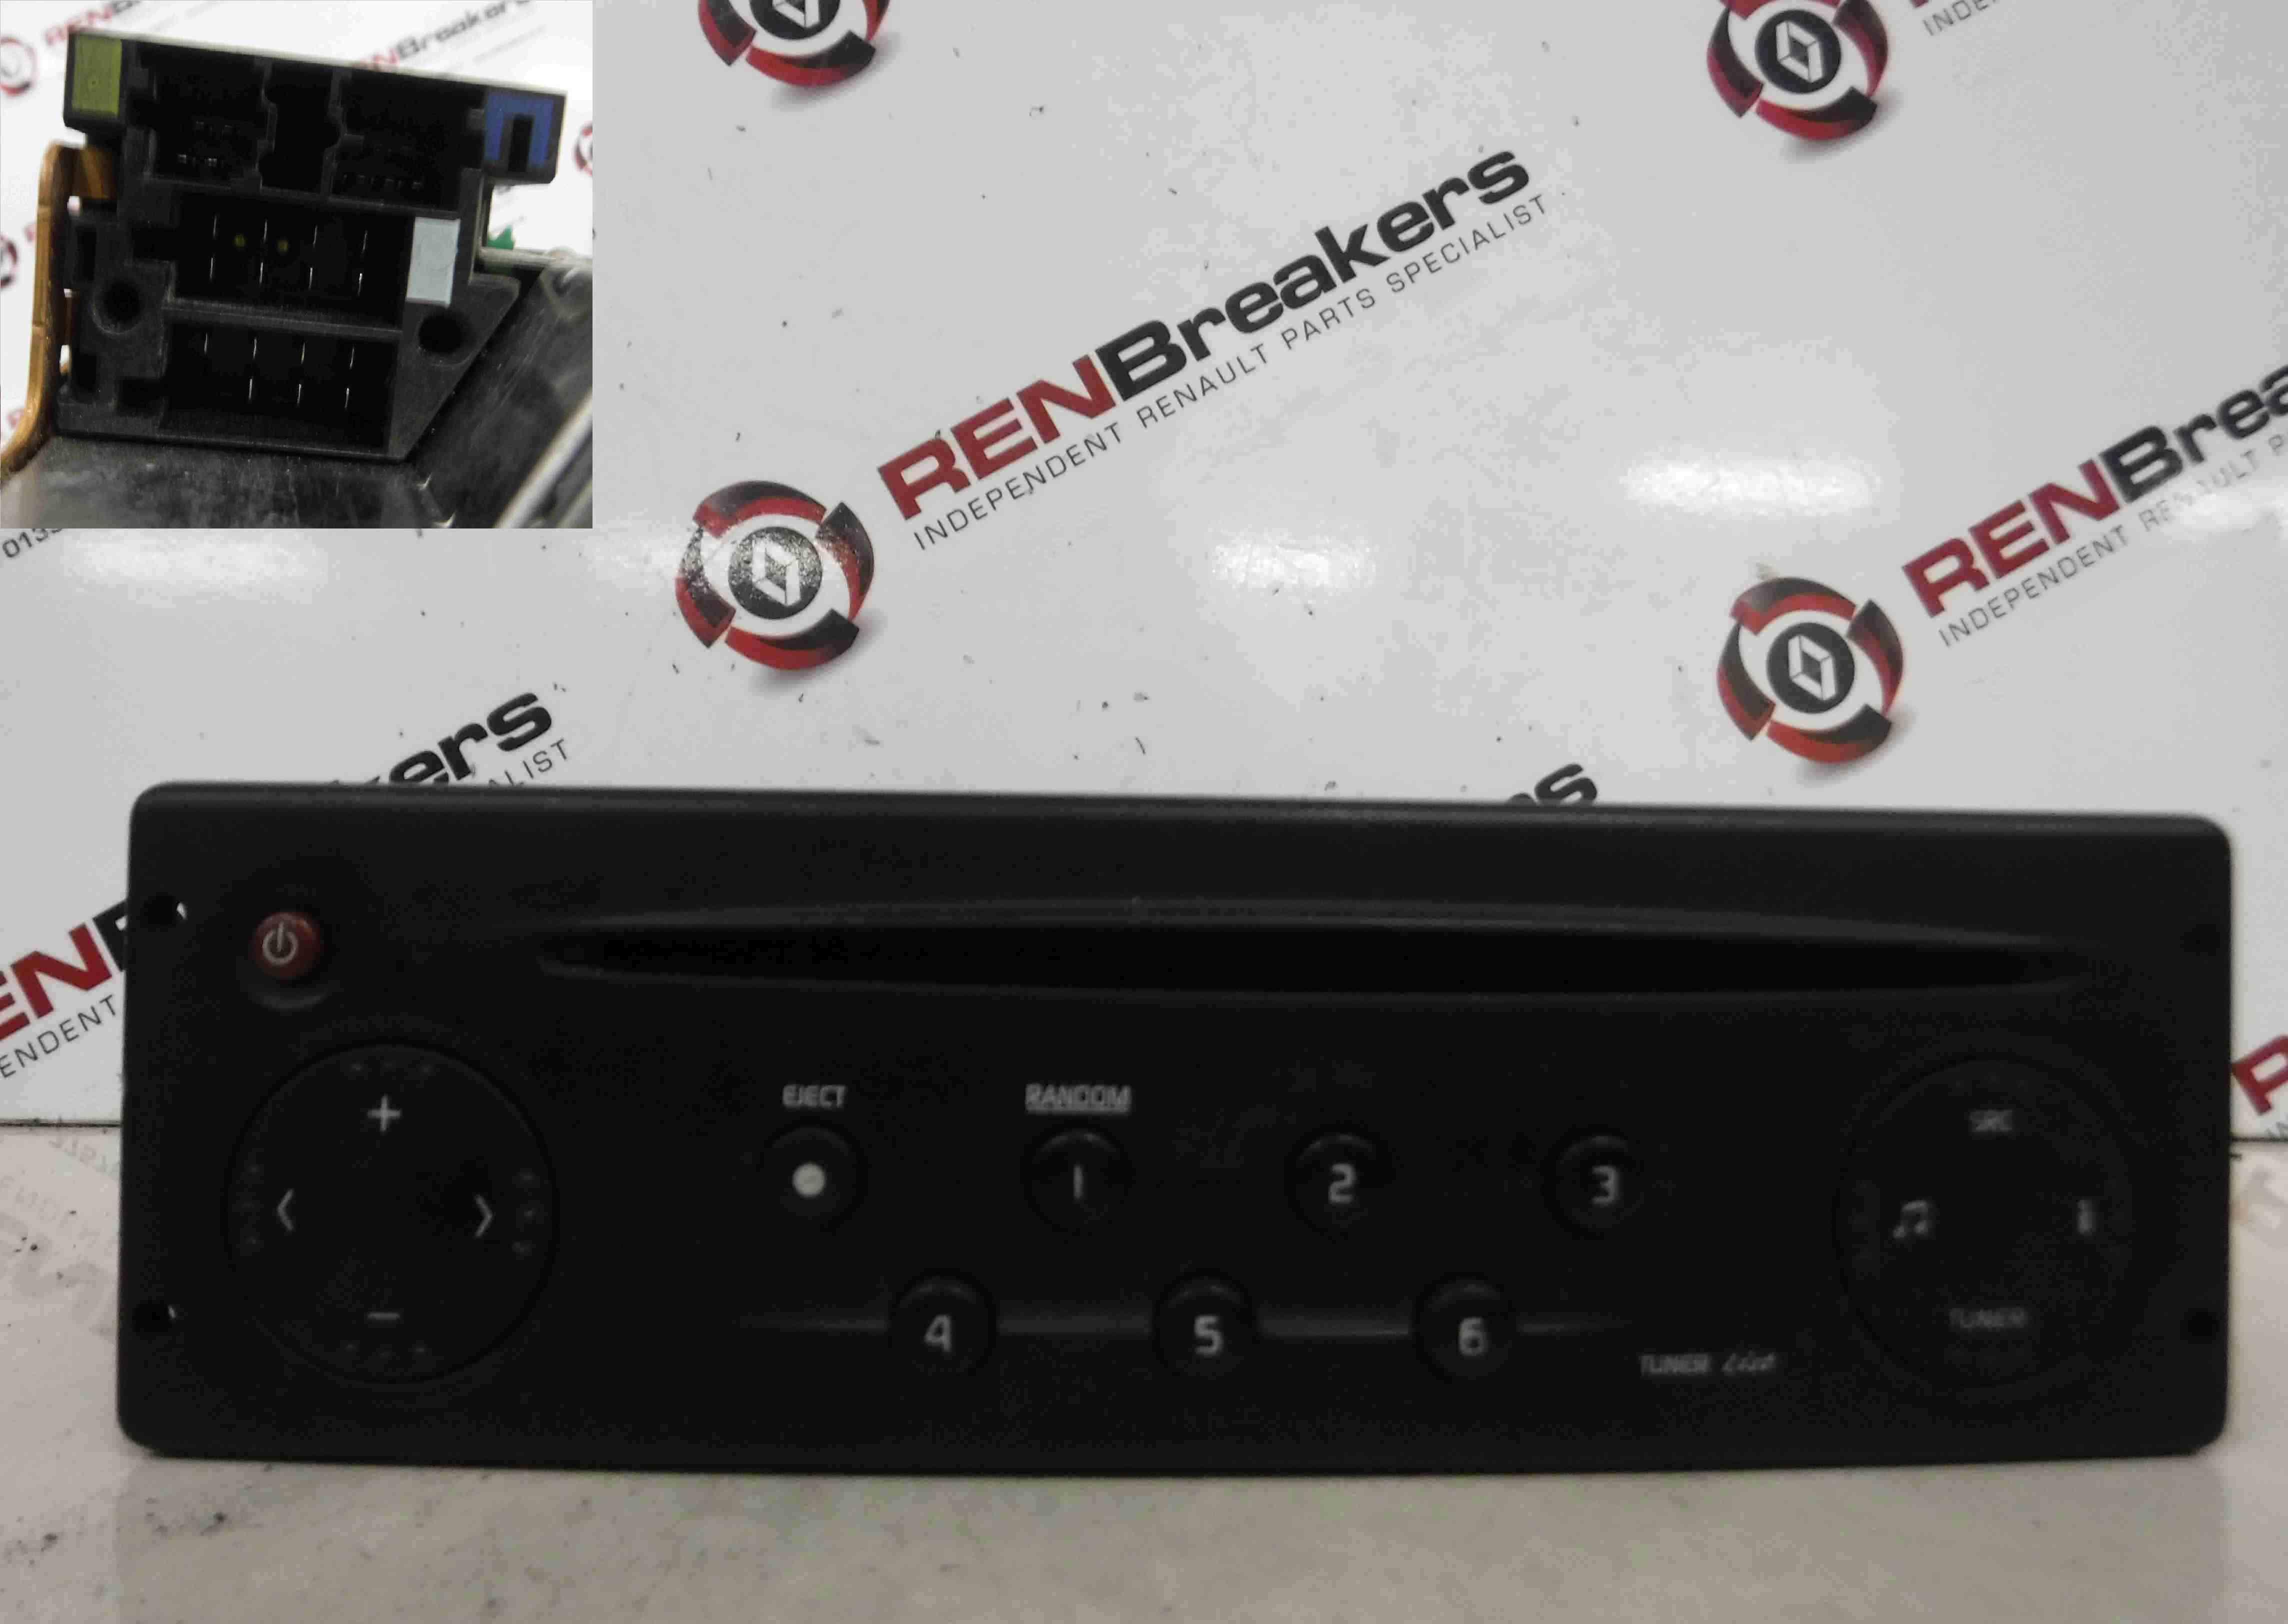 Renault Clio MK2 1998-2001 Radio Cd Player Tuner List + Code 8200057681